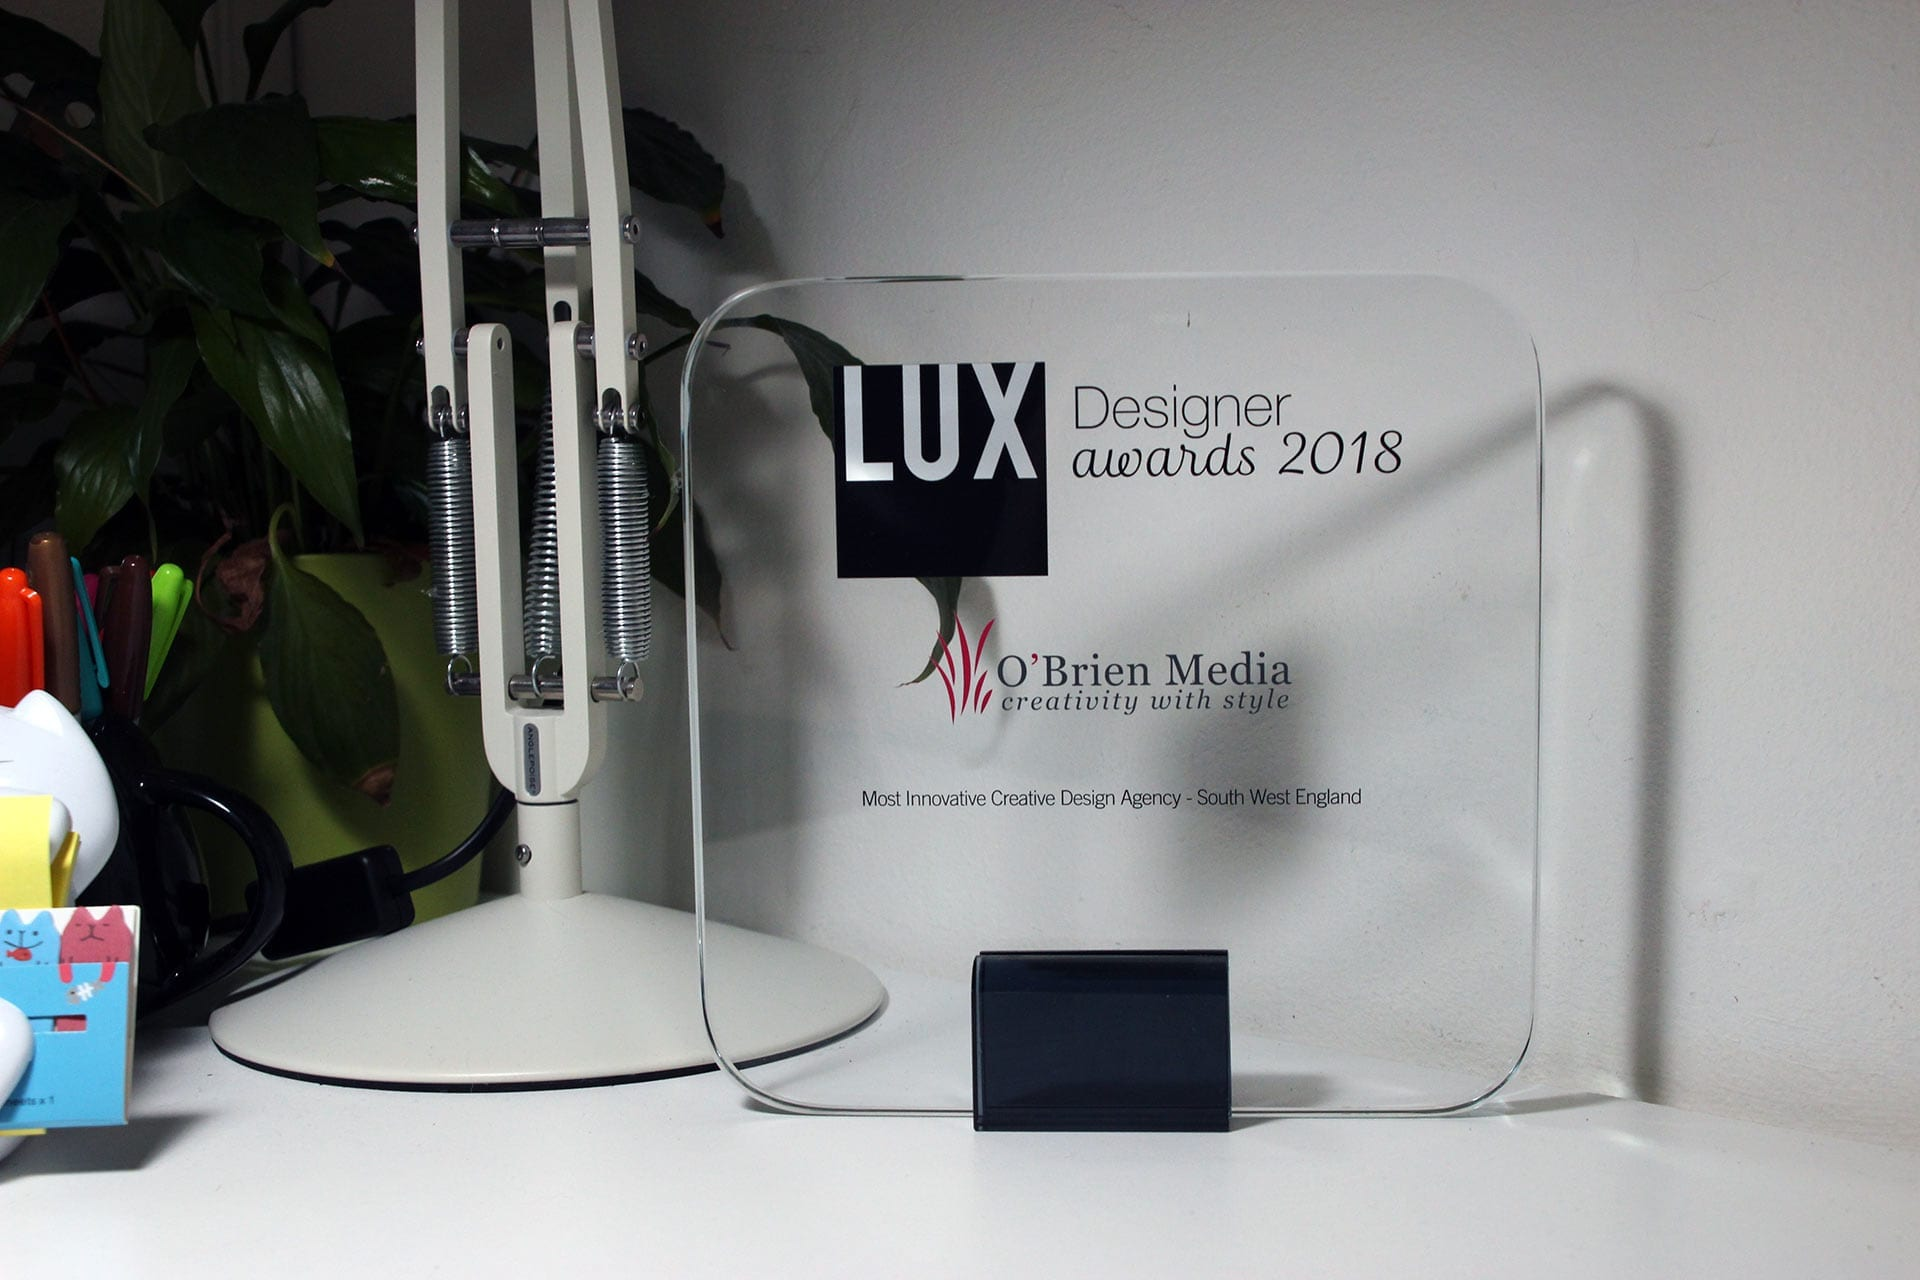 2018-designer-awards-obrien-media-awarded-most-innovative-creative-design-agency-south-west-england.jpg